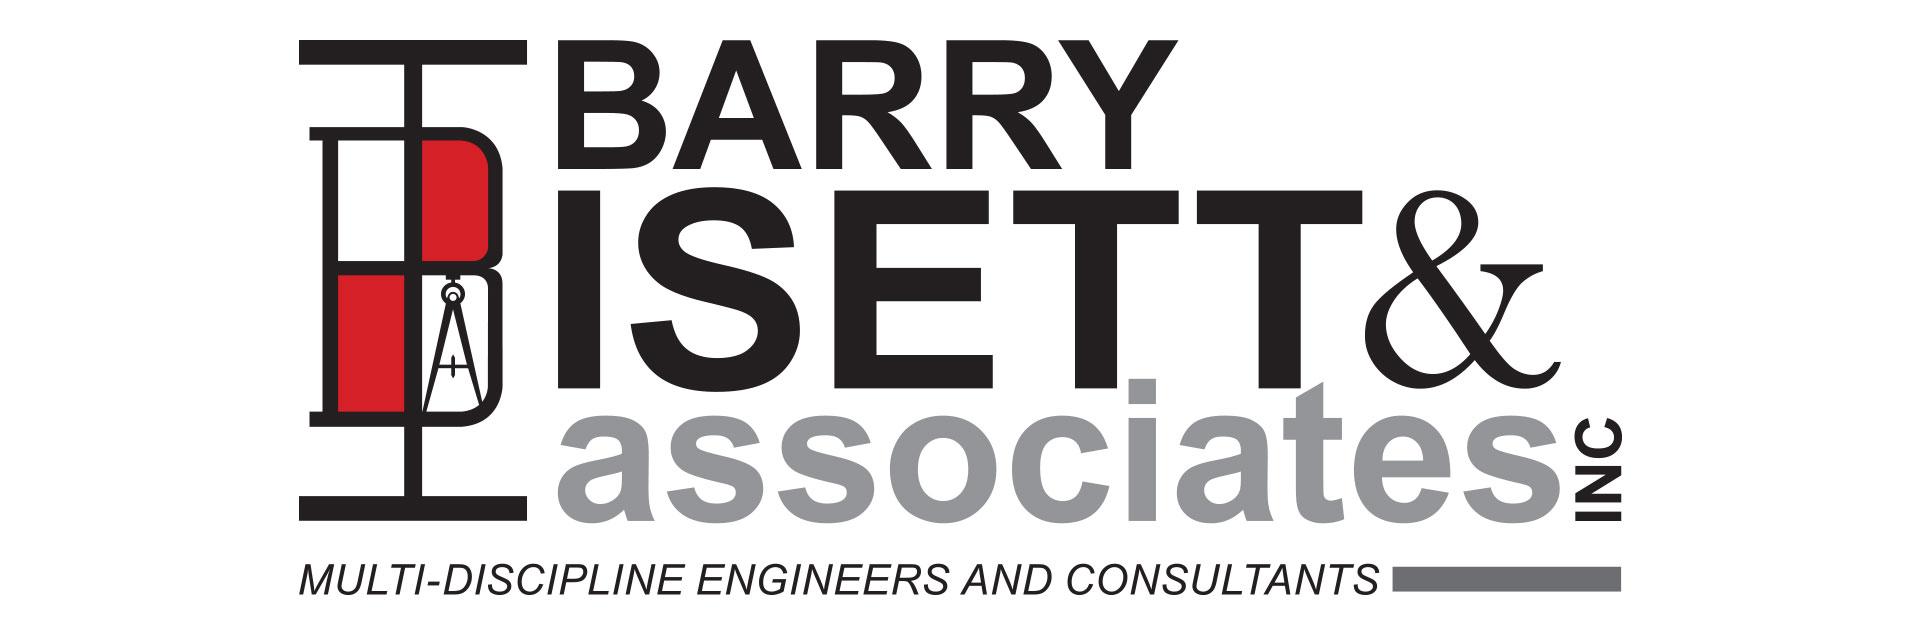 Barry Isett & Associates logo